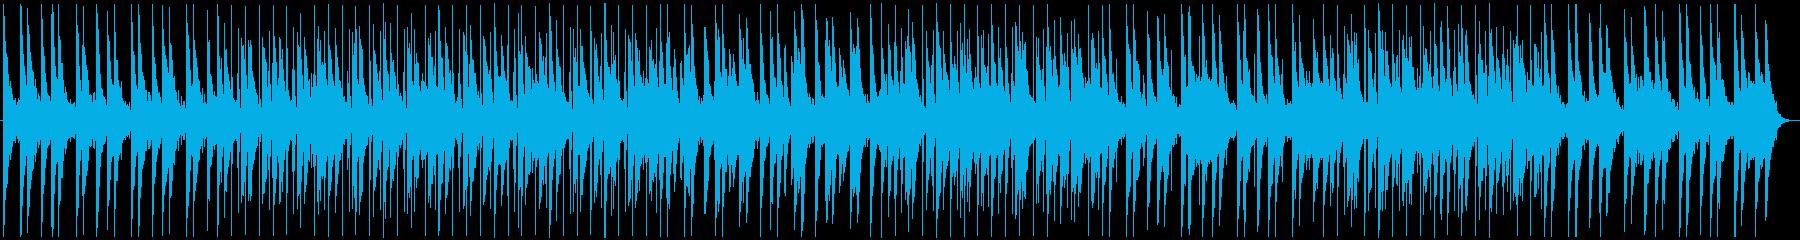 Calm / Relax / Chill / LoFi's reproduced waveform